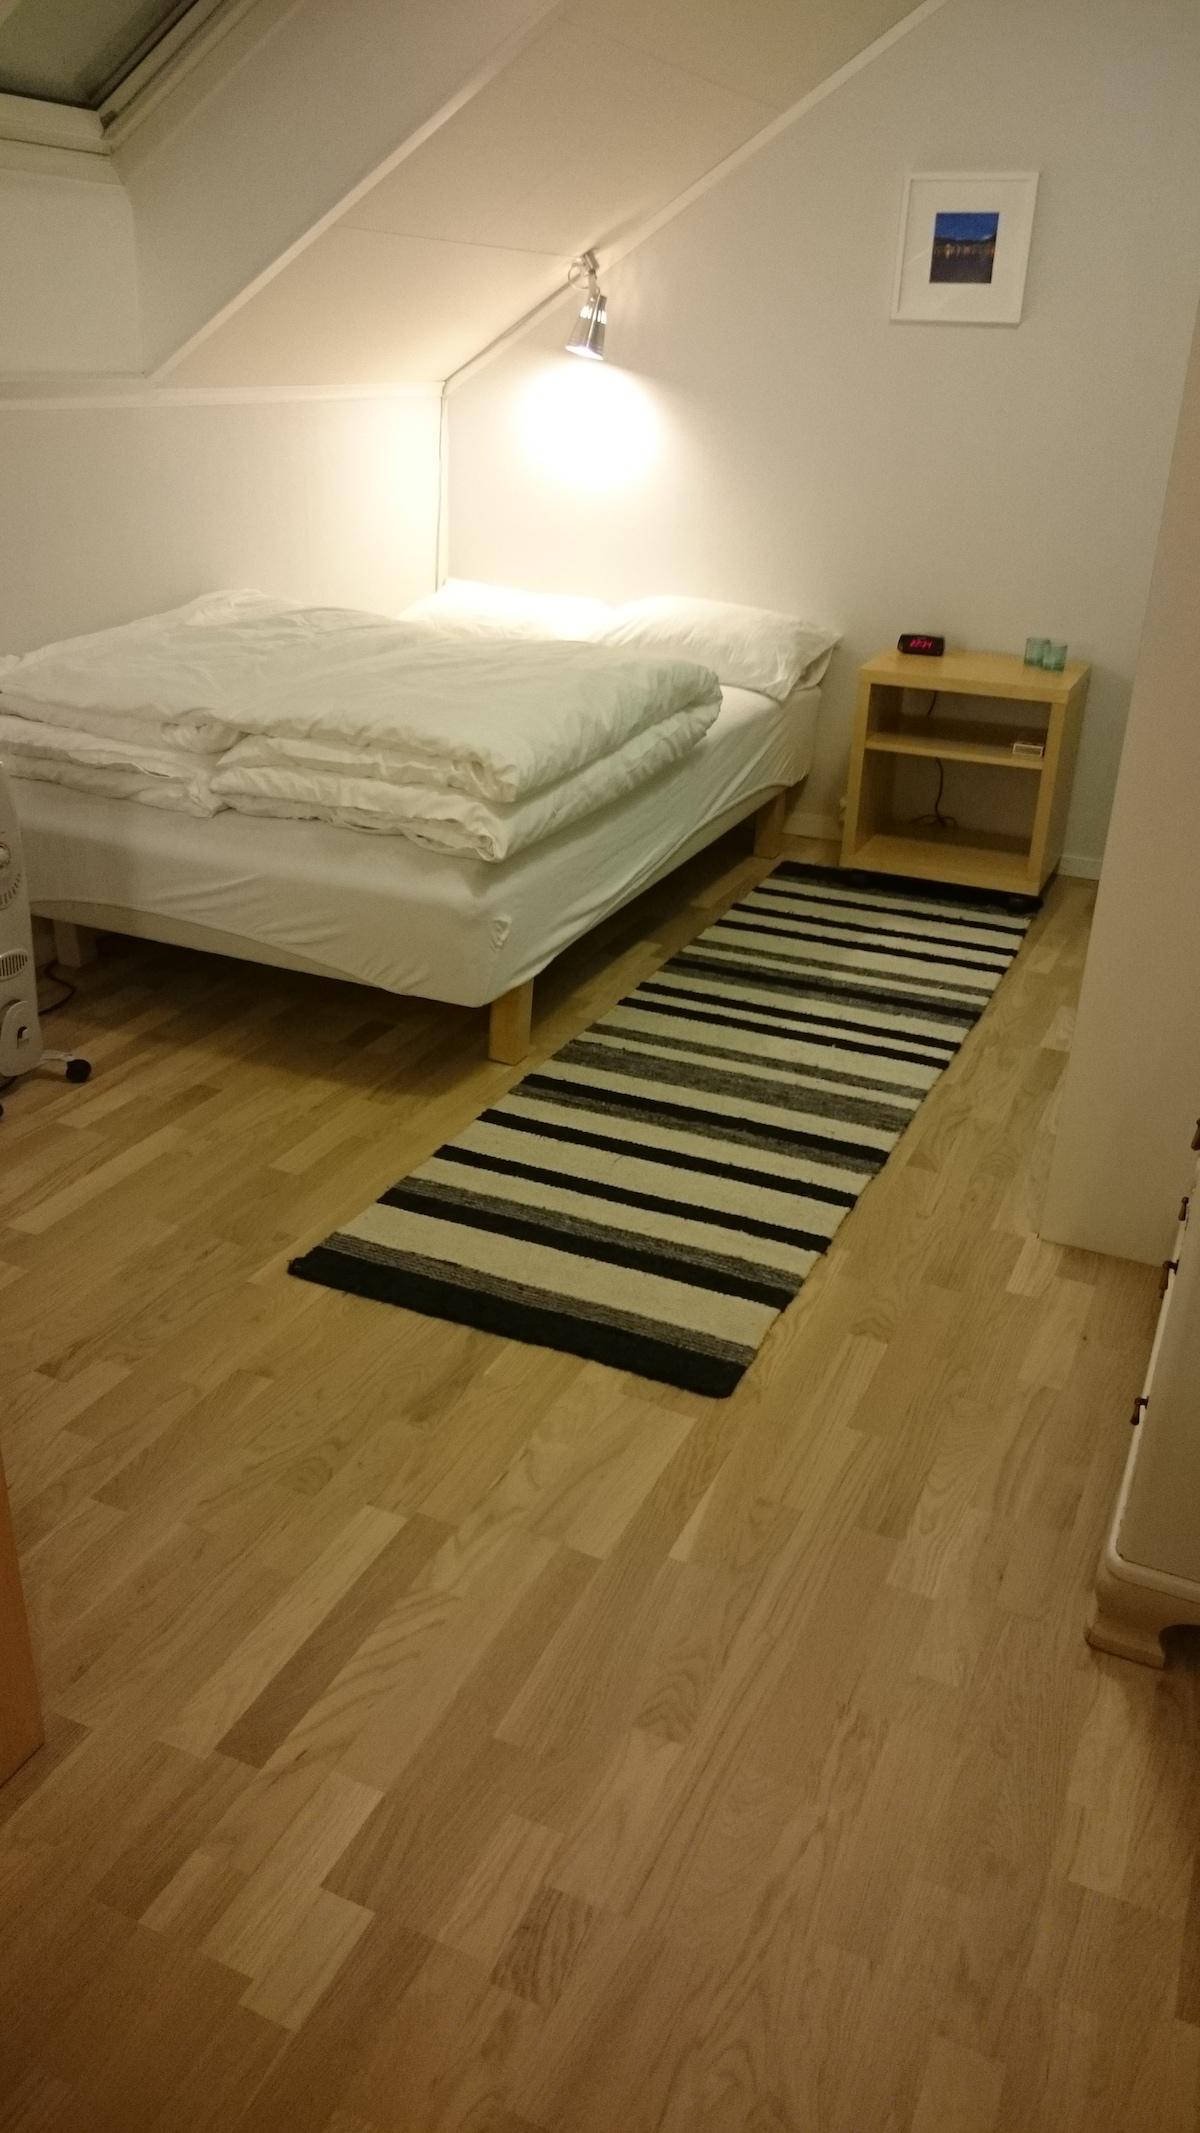 New wood floor (oak) and new carpet!